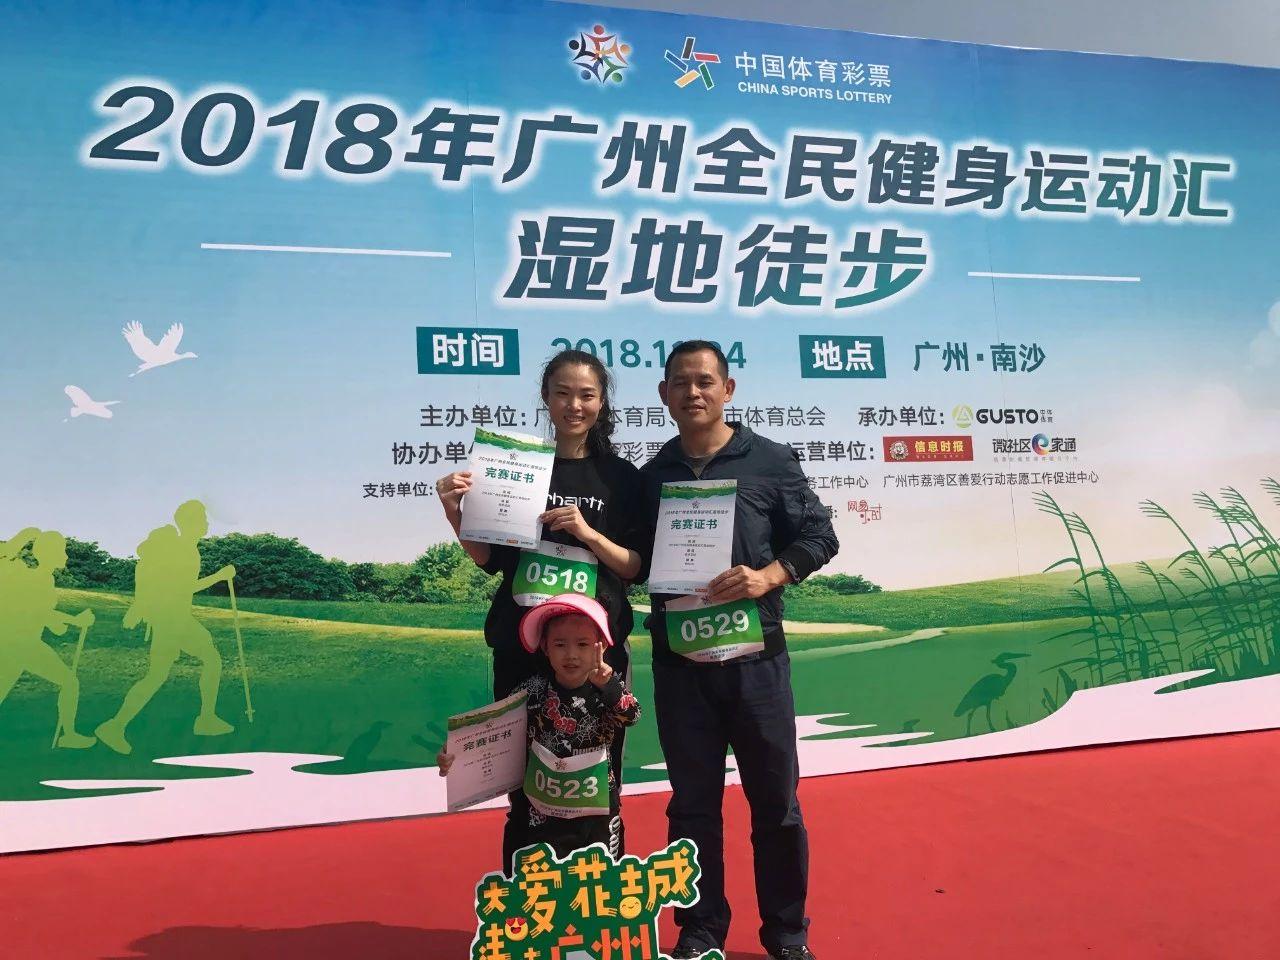 http://img.sport-china.cn/181128155bfe46a282376.jpeg